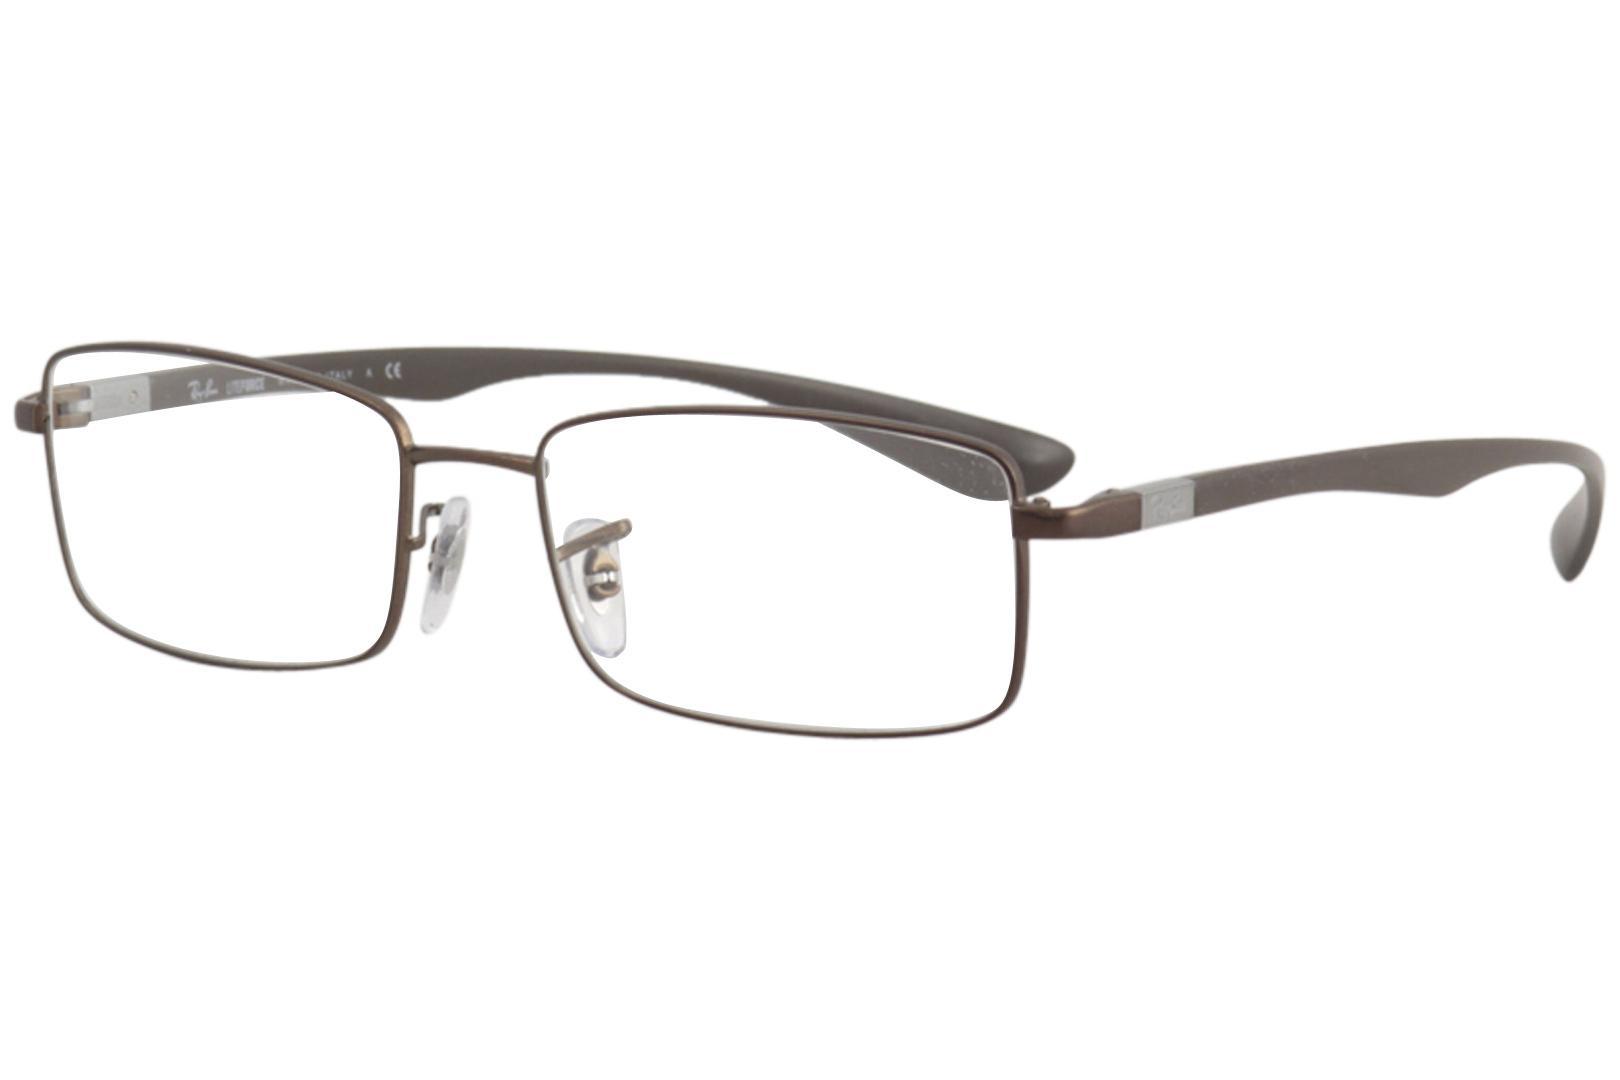 4ff132d6a7 Ray Ban Men s Eyeglasses Liteforce RX6286 RX 6286 RayBan Optical Frame